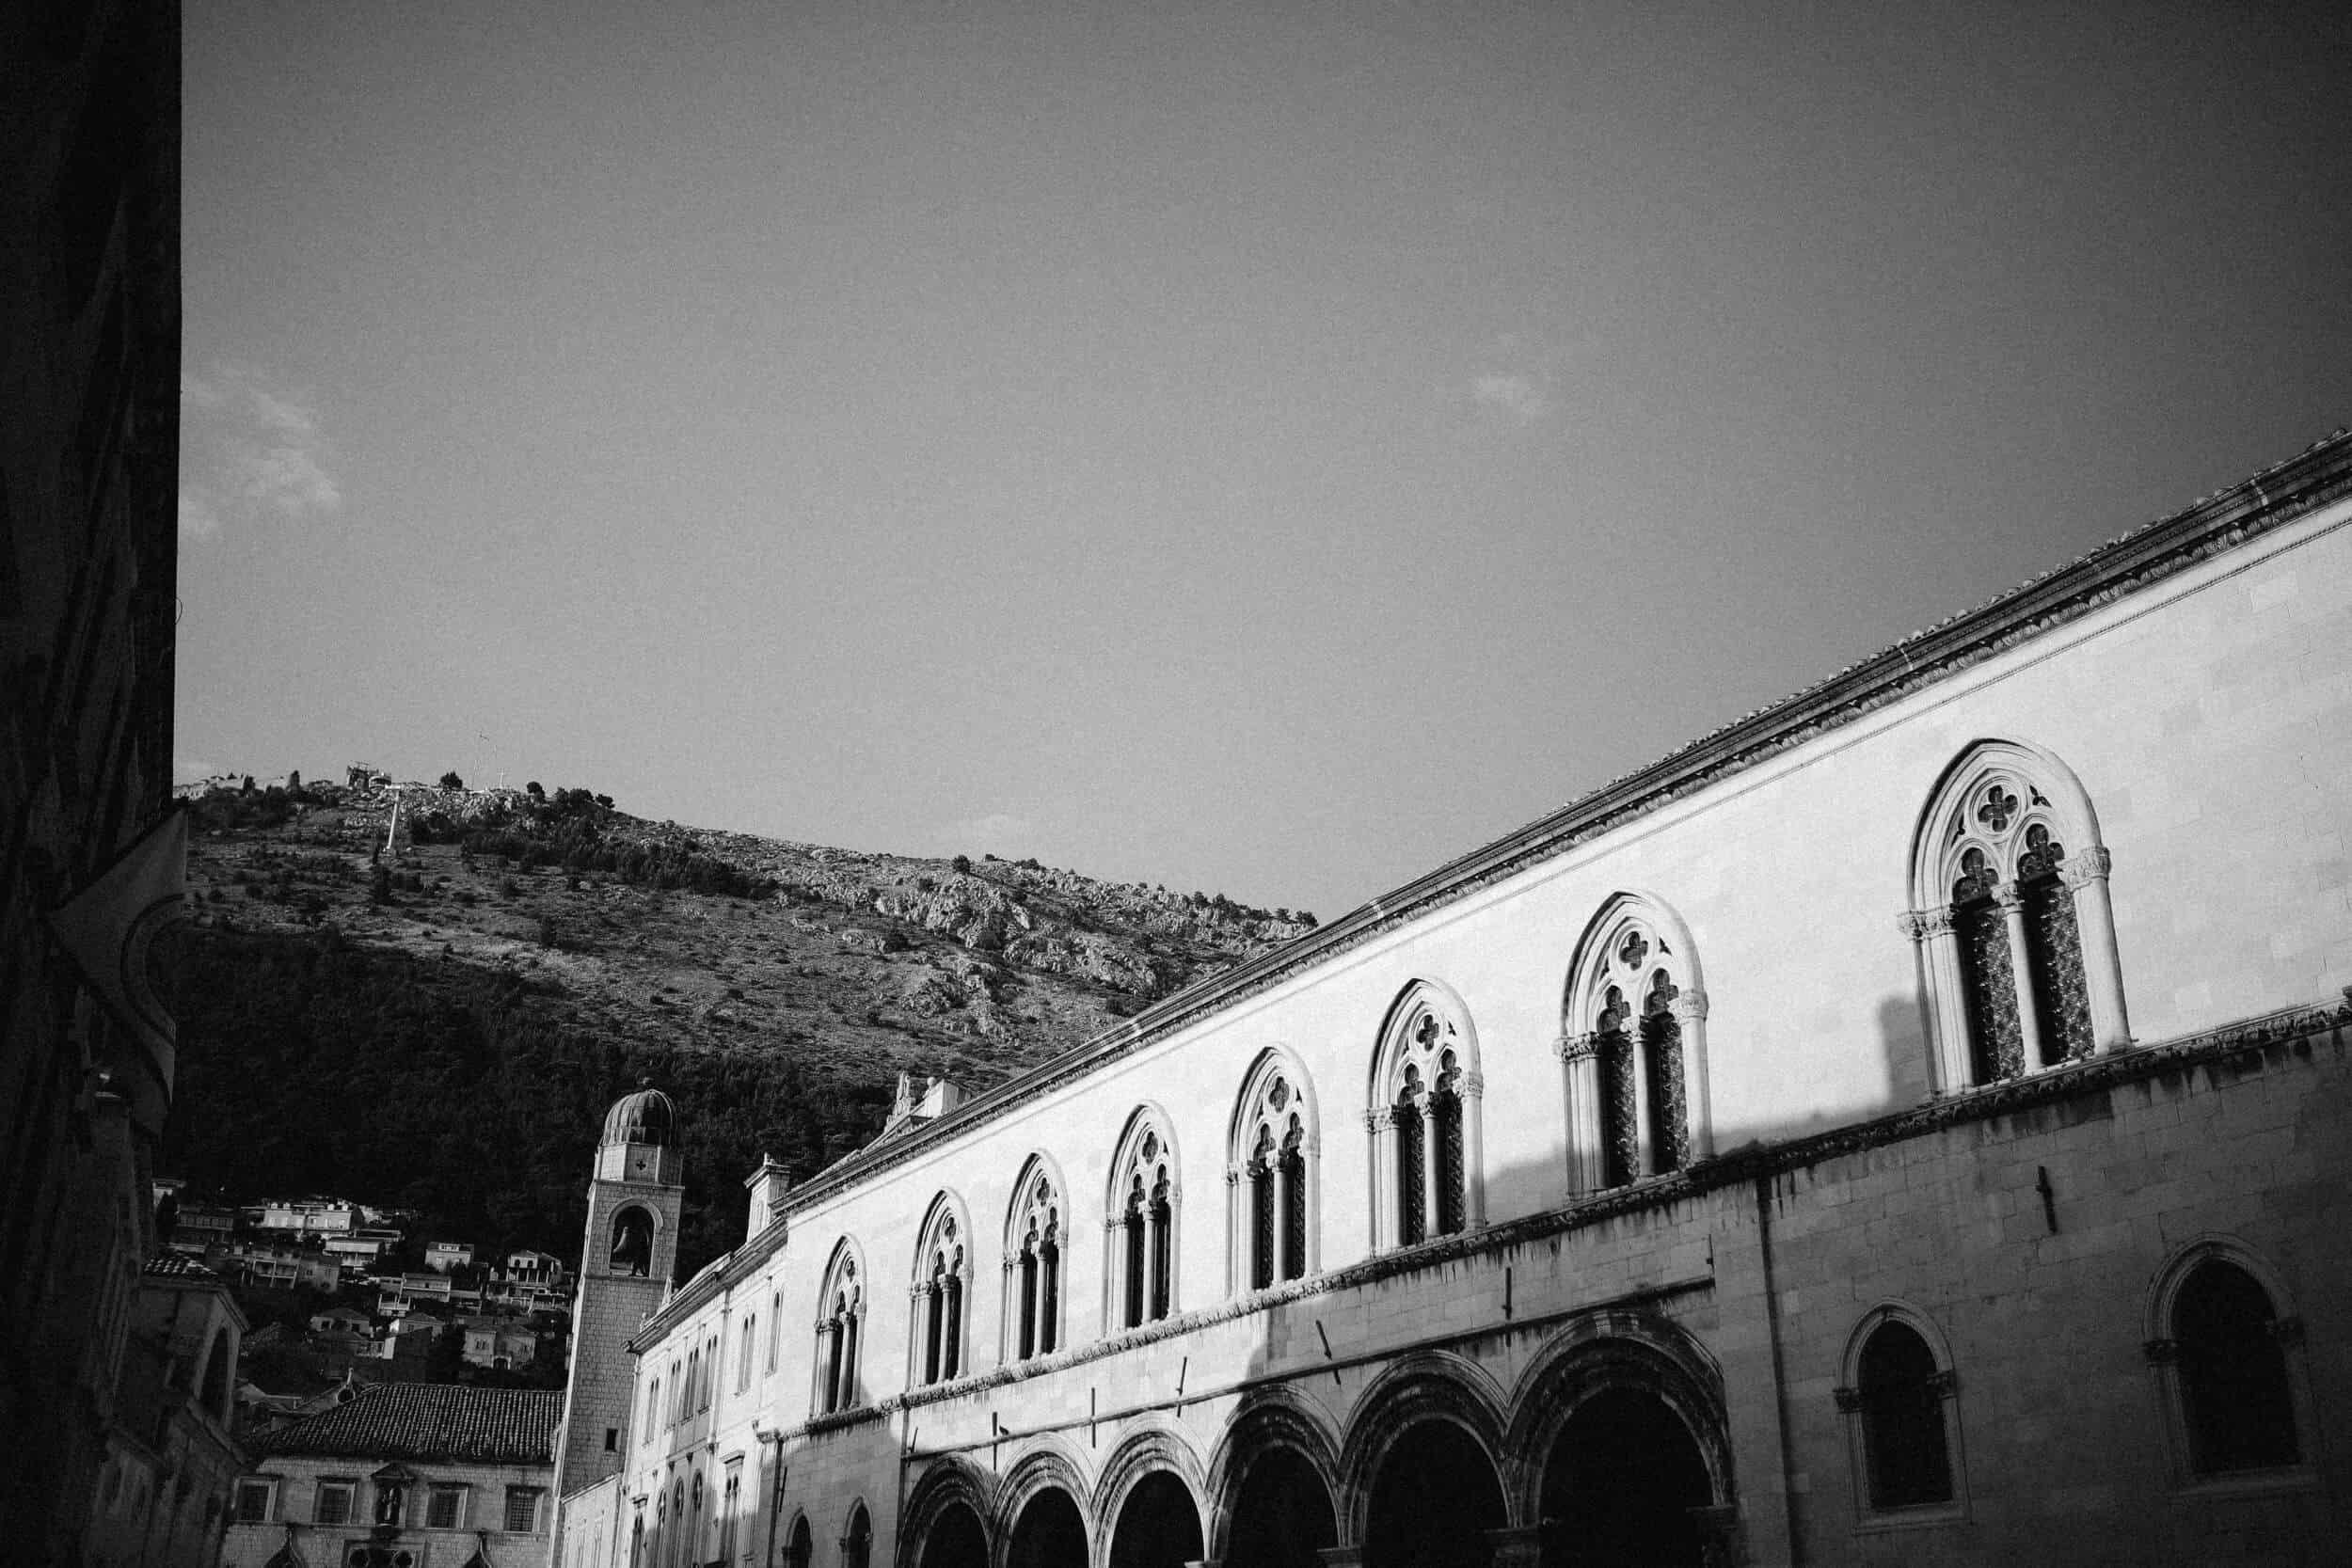 Dubrovnik karaka boat elopement matea stephan 8 | Croatia Elopement Photographer and Videographer